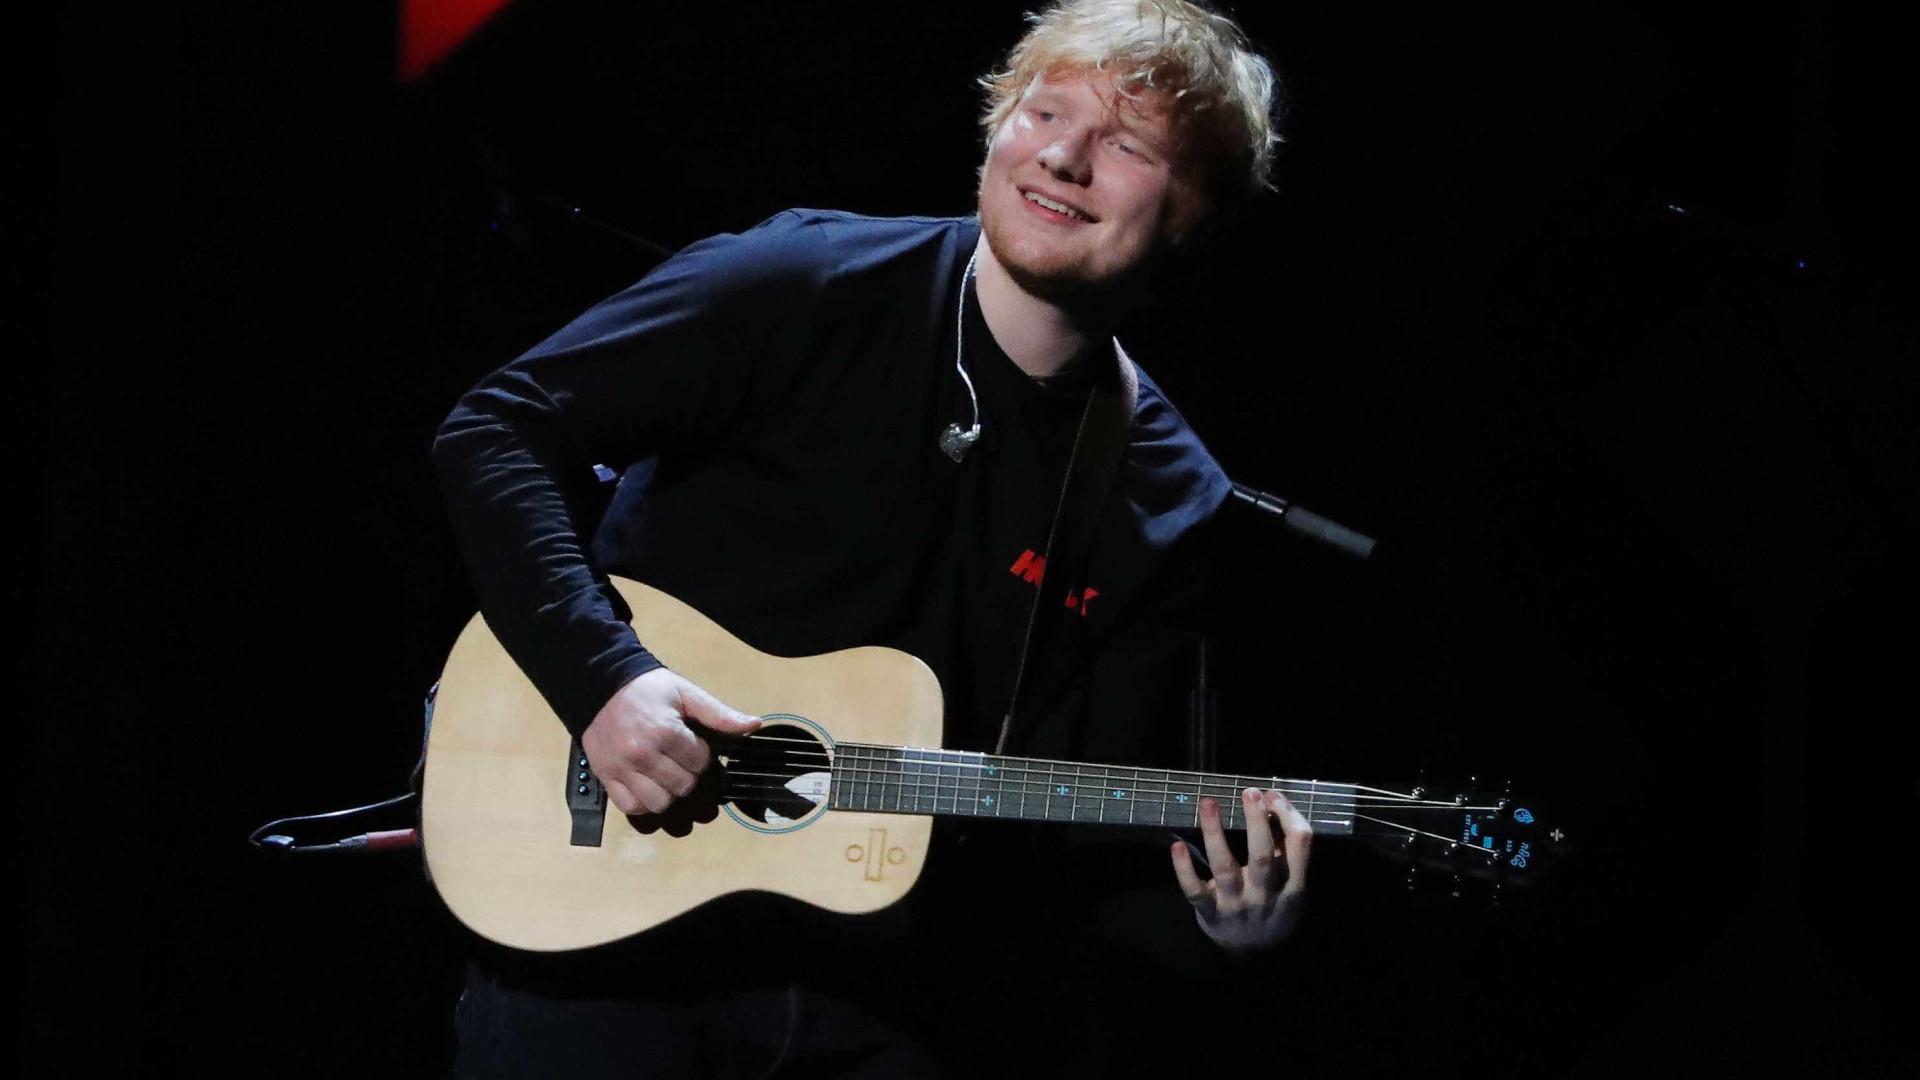 Em italiano, Ed Sheeran canta versão de 'Perfect' com Andrea Bocelli